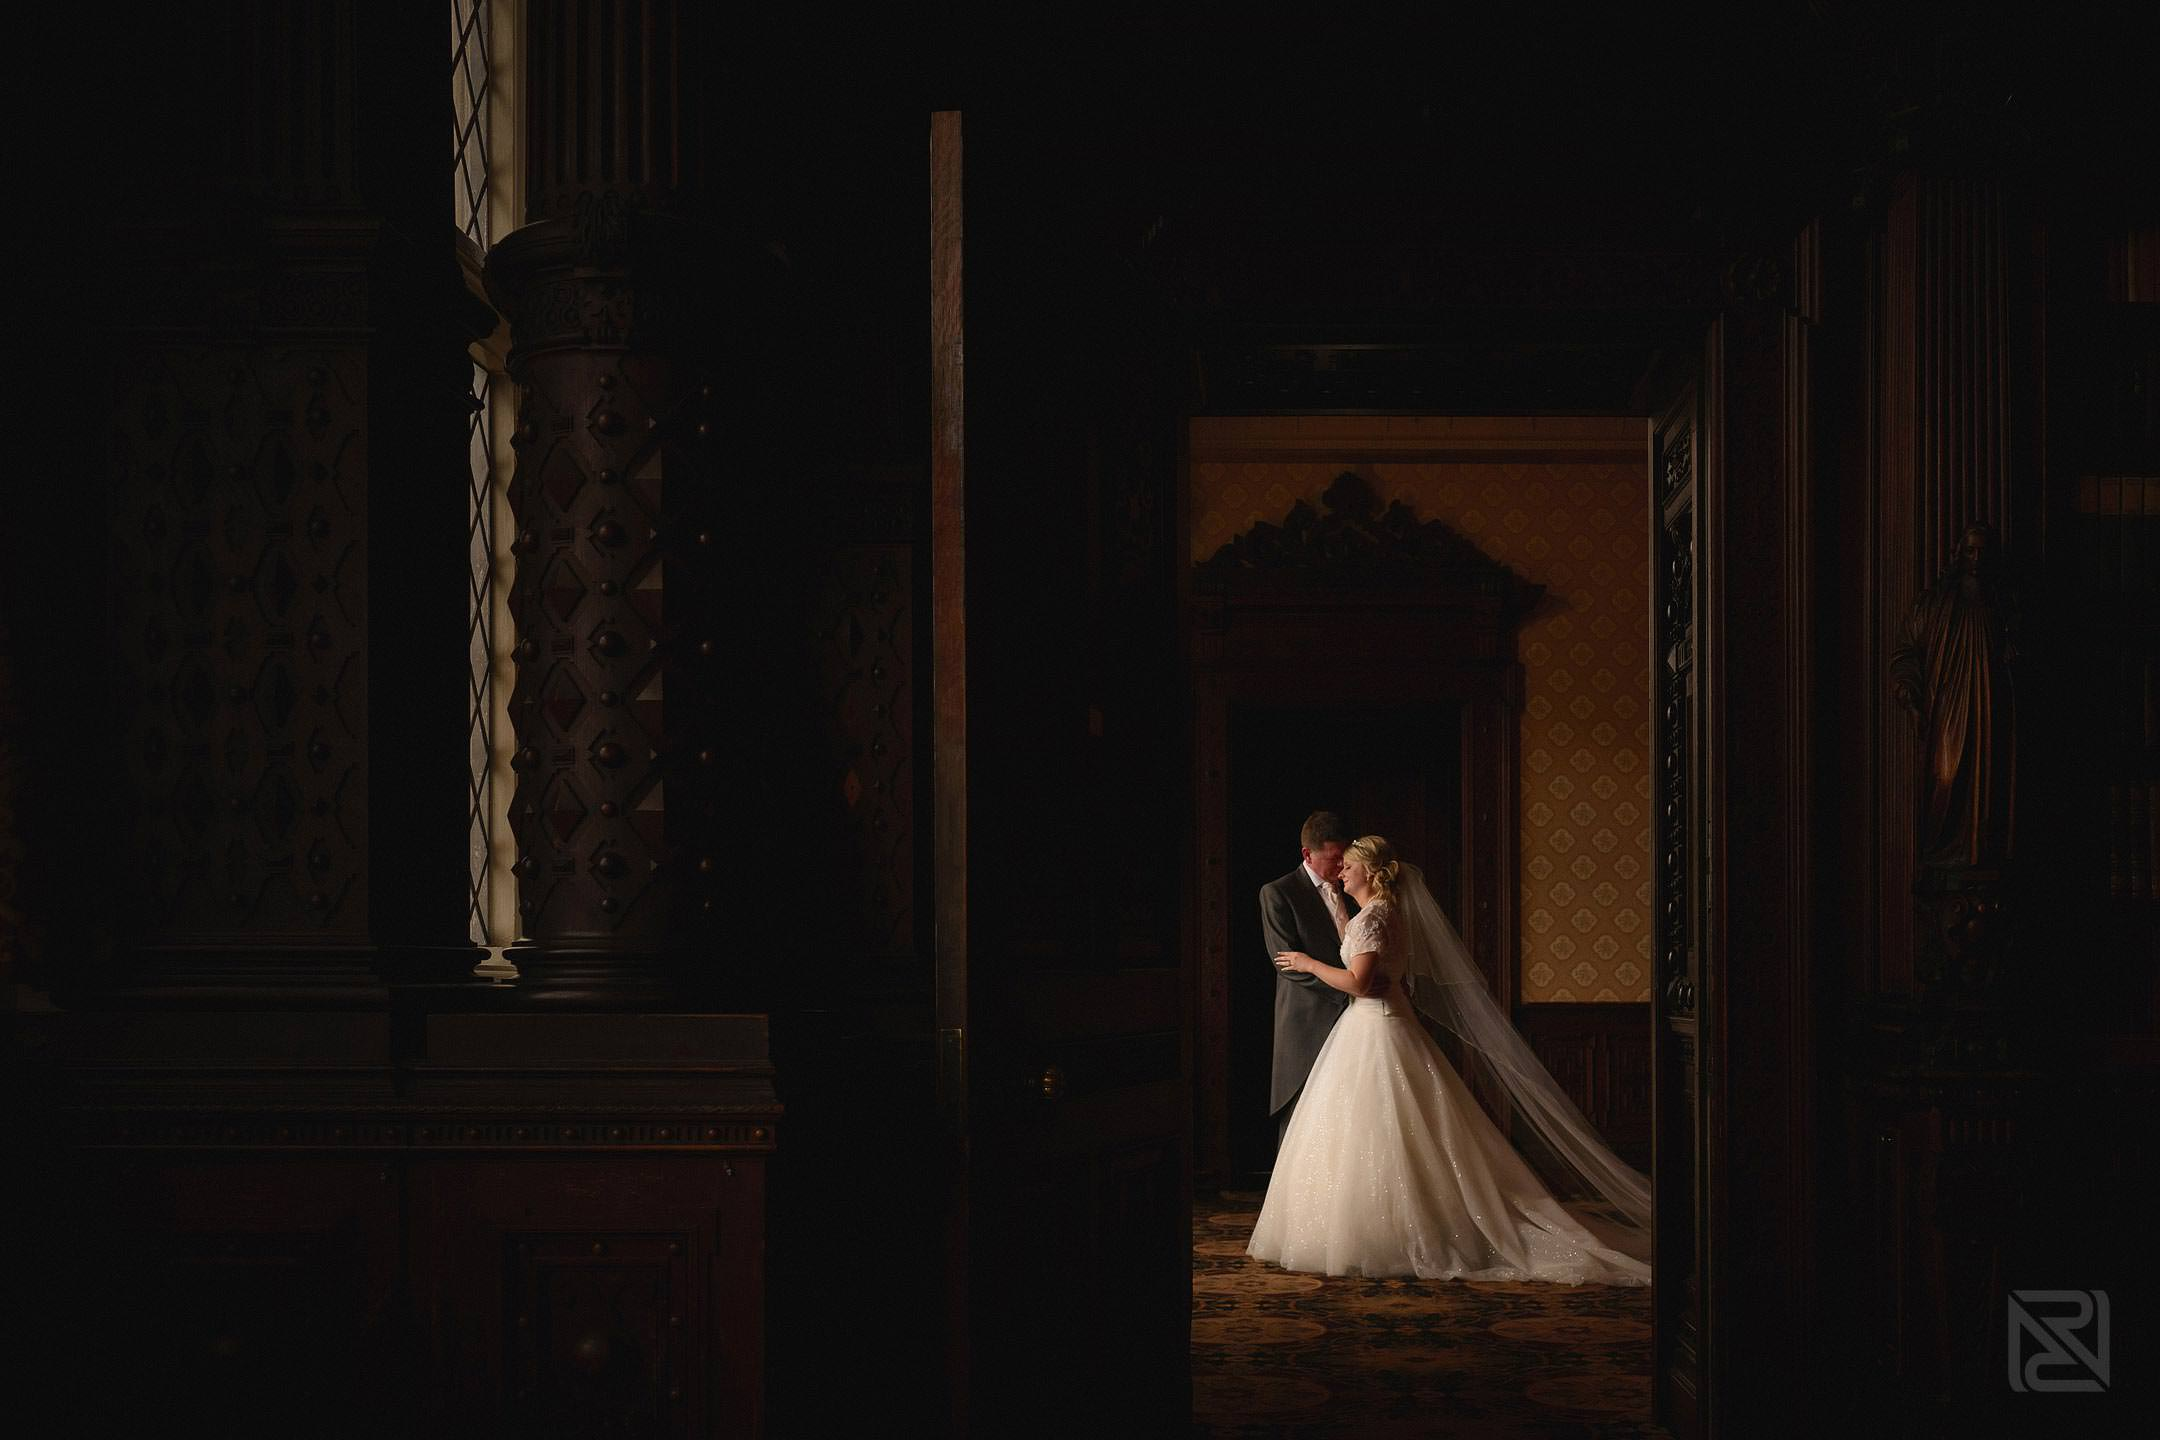 best-wedding-photographs-2015-087